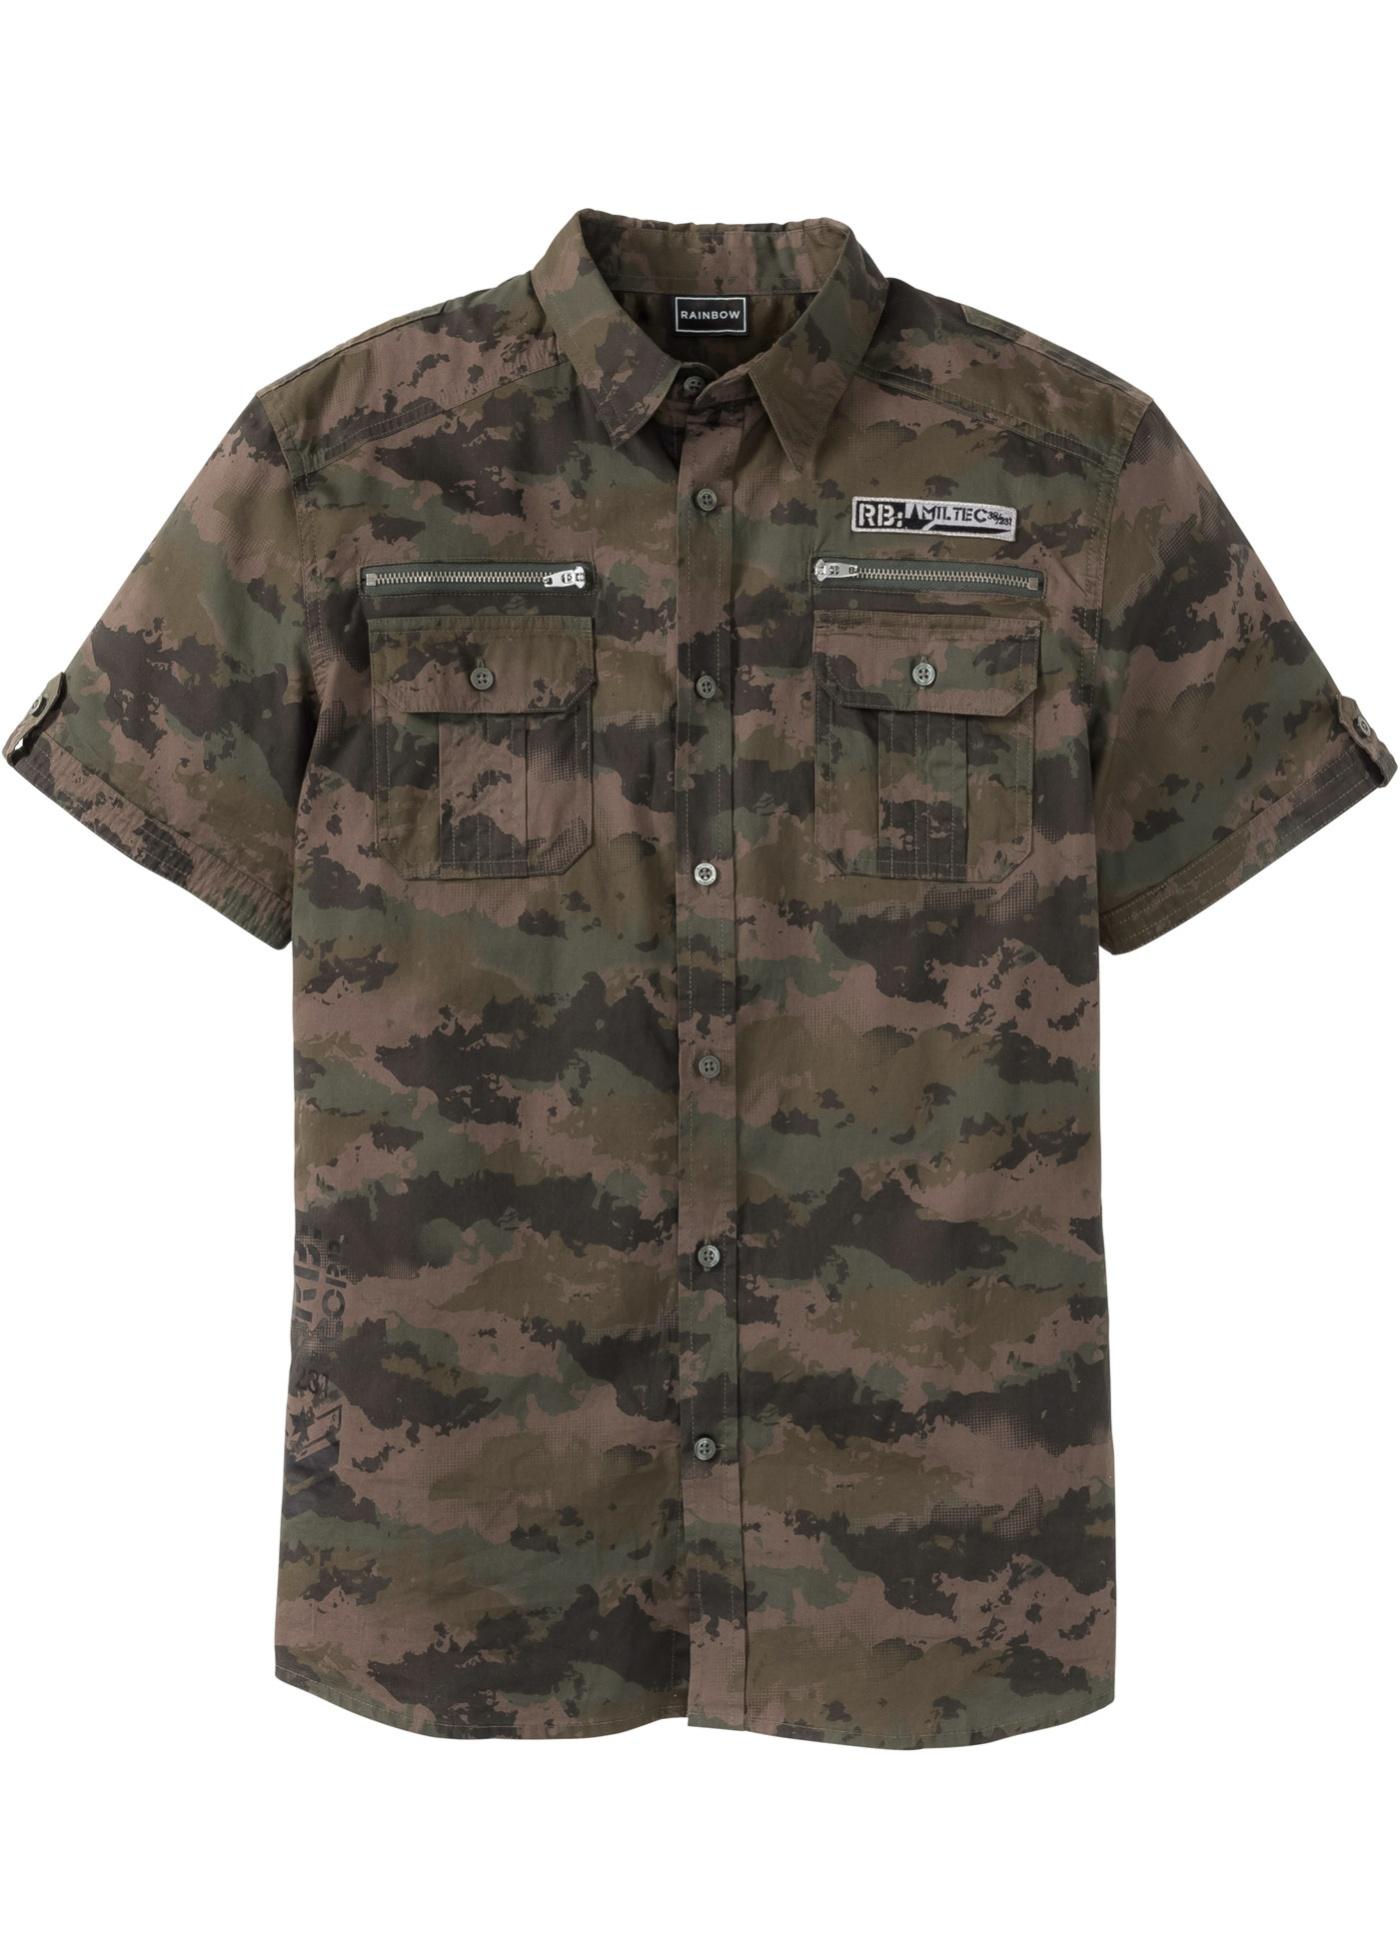 Bonprix SE - Kortärmad skjorta, smal passform 249.00